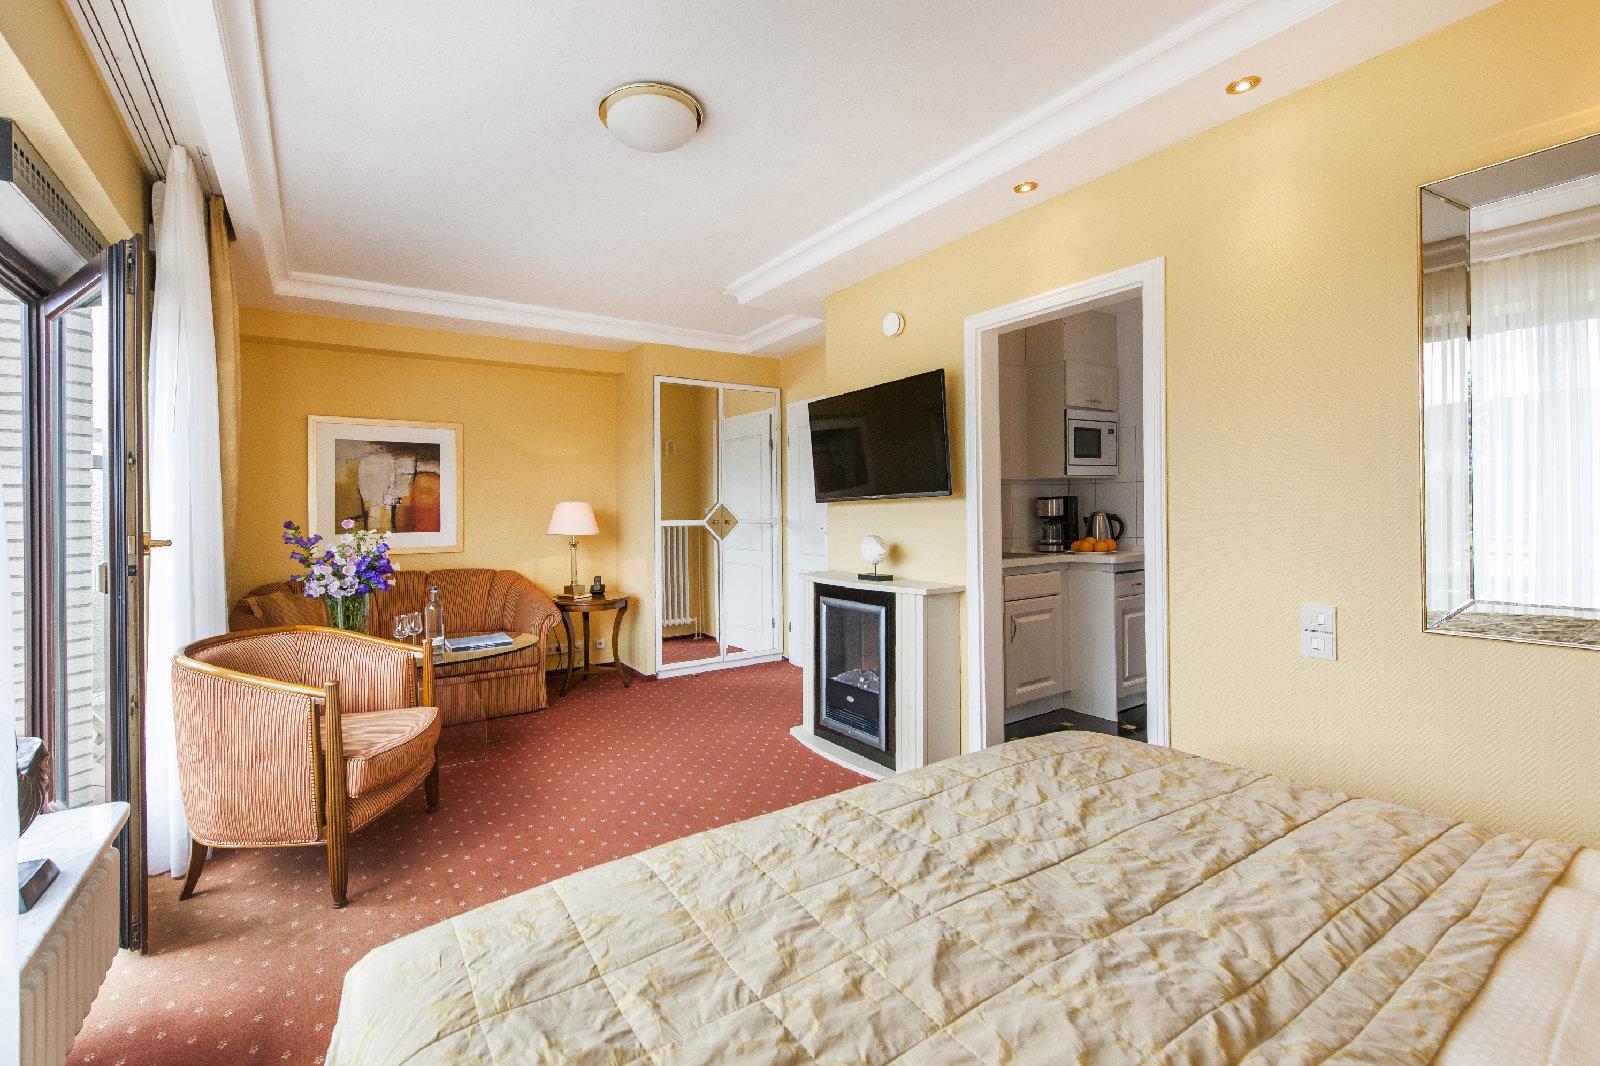 1 5 zimmer apartment mit teilseeblick im winter. Black Bedroom Furniture Sets. Home Design Ideas